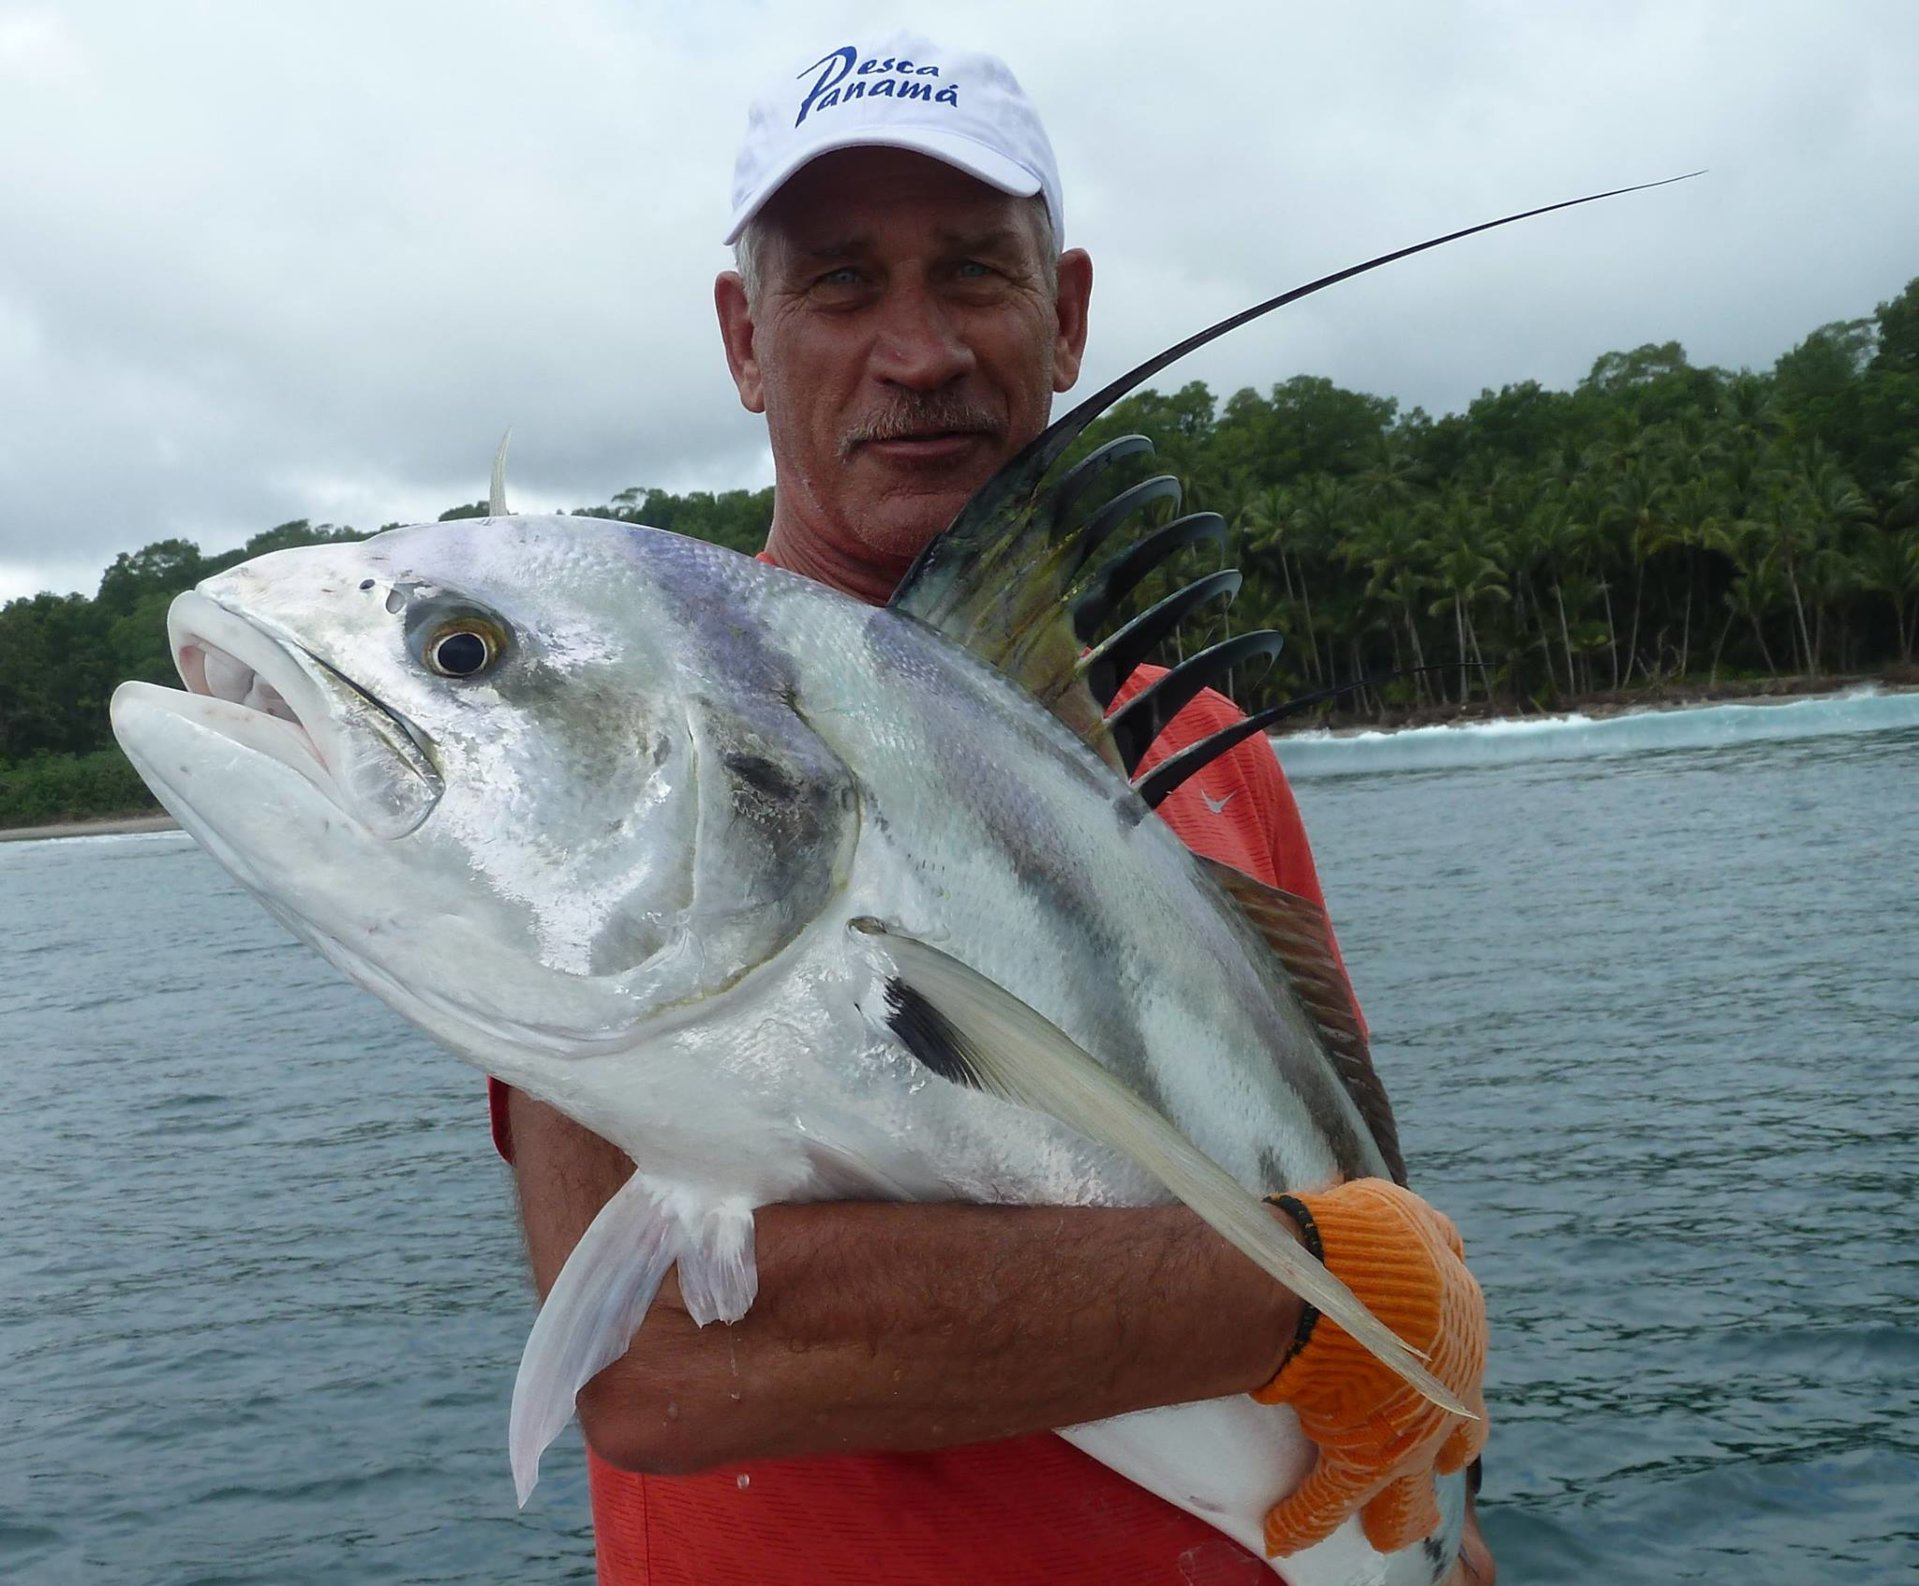 Pesca panama fishing report bloodydecks for Bloodydecks fish report